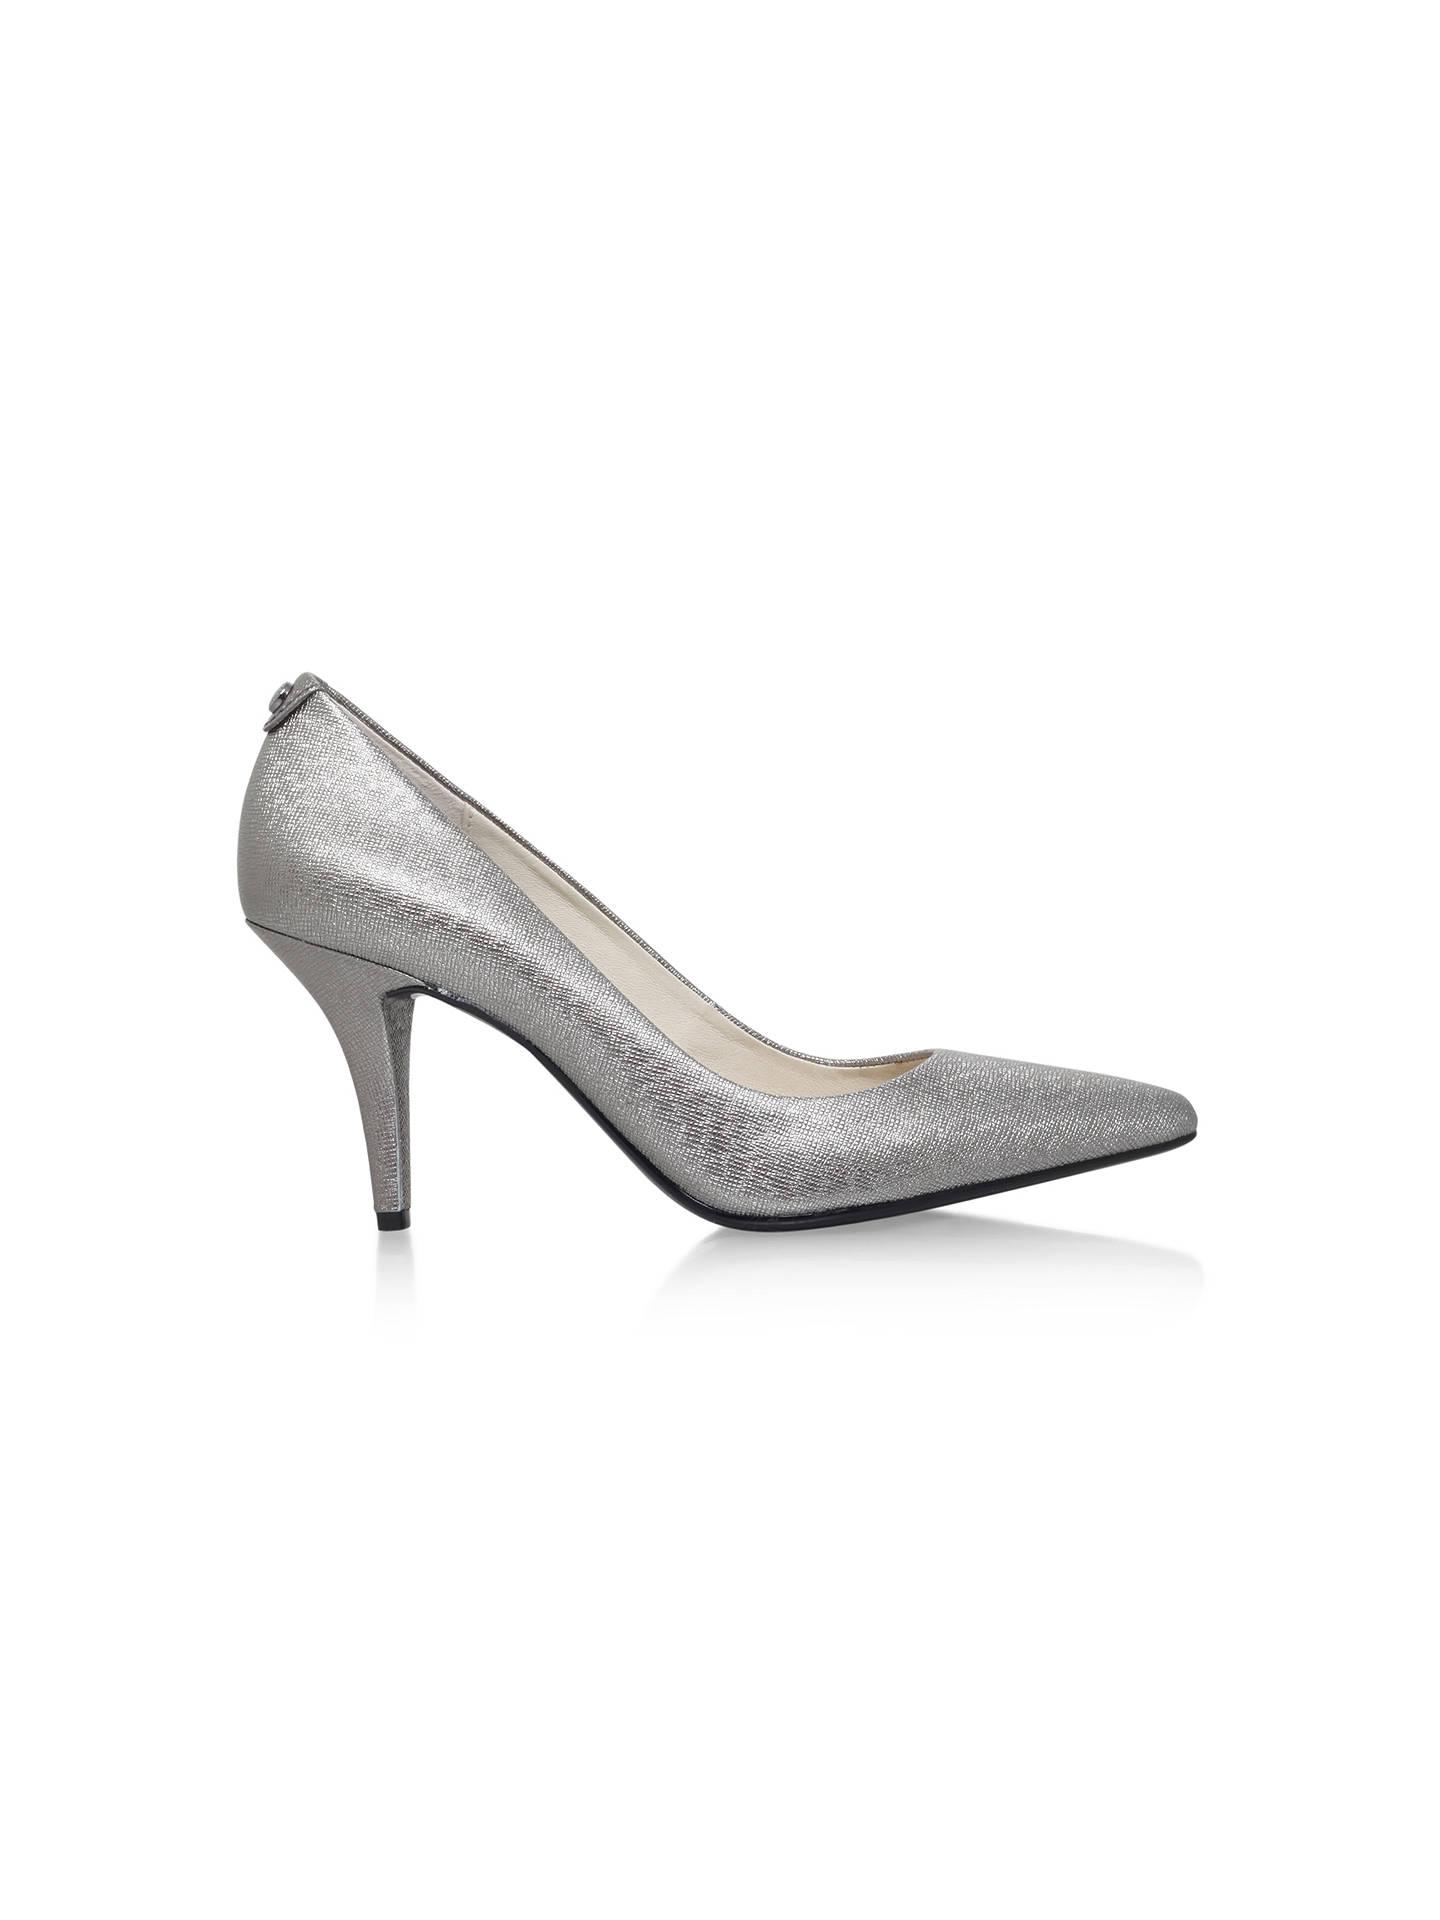 66bf7519184 MICHAEL Michael Kors Flex High Heeled Stiletto Court Shoes at John ...